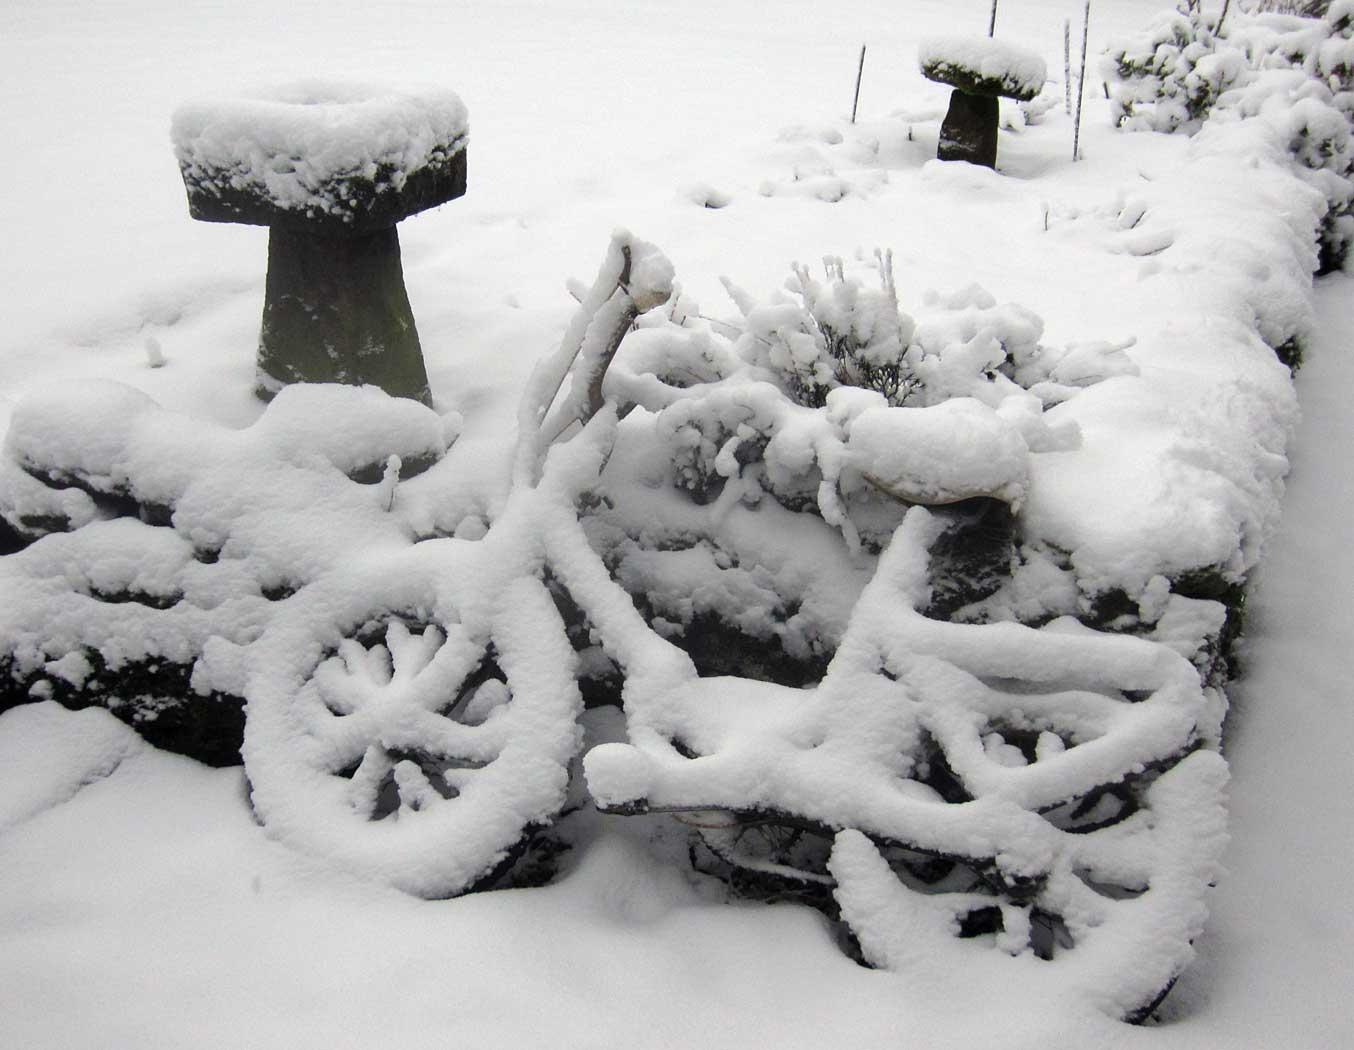 Winter 2012/2013